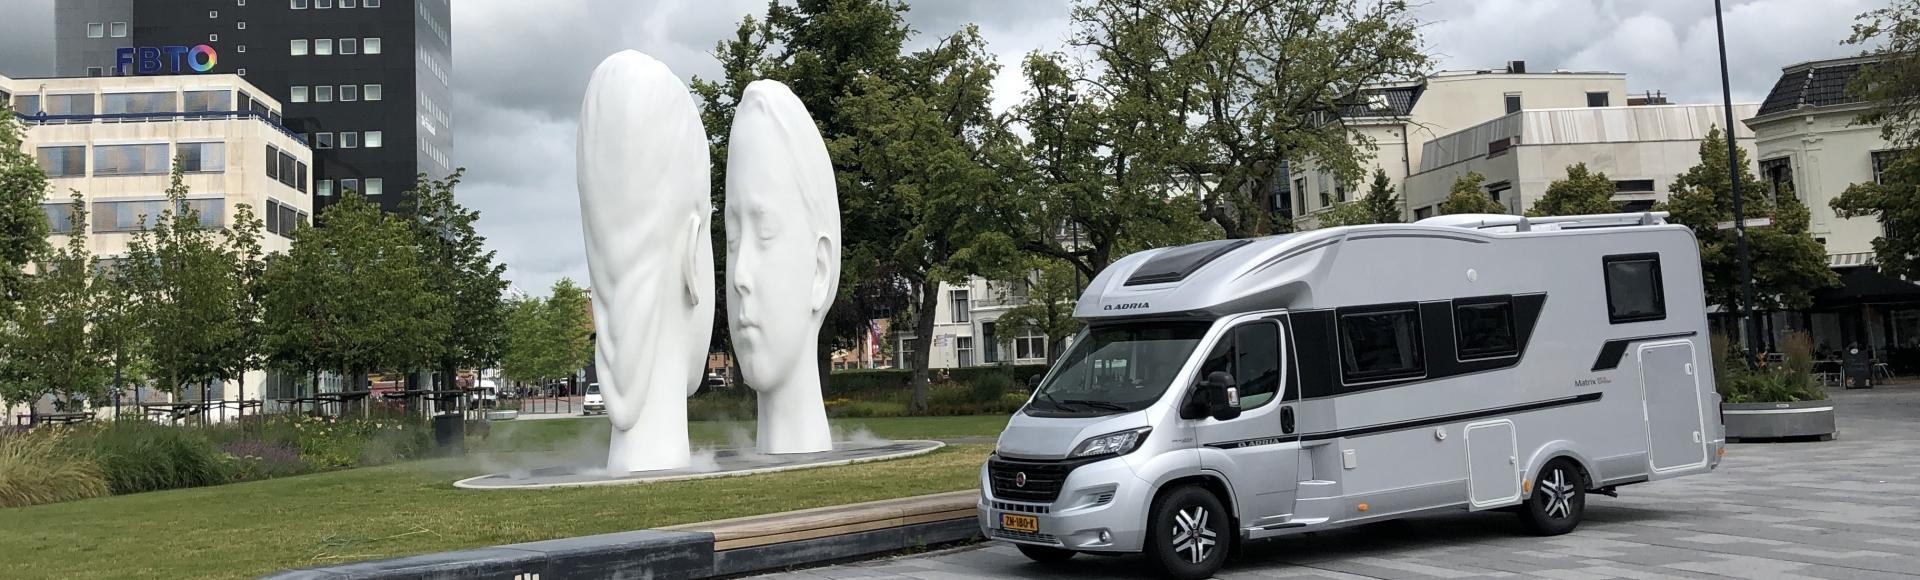 11fountains, Leeuwarden